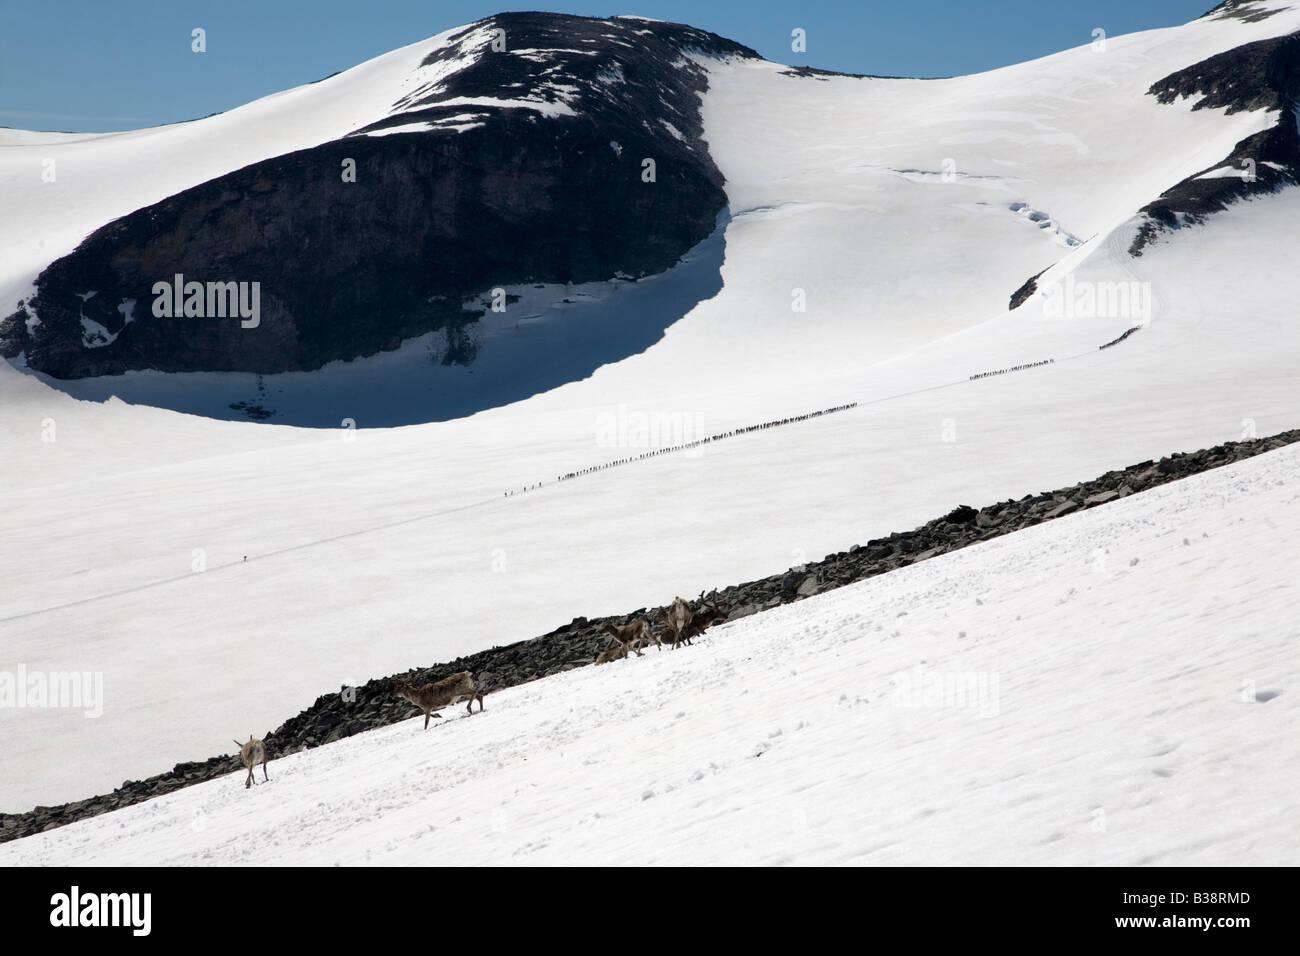 Norway Galdhöpiggen glacier with reindeer and people on glacier summer 2008 - Stock Image